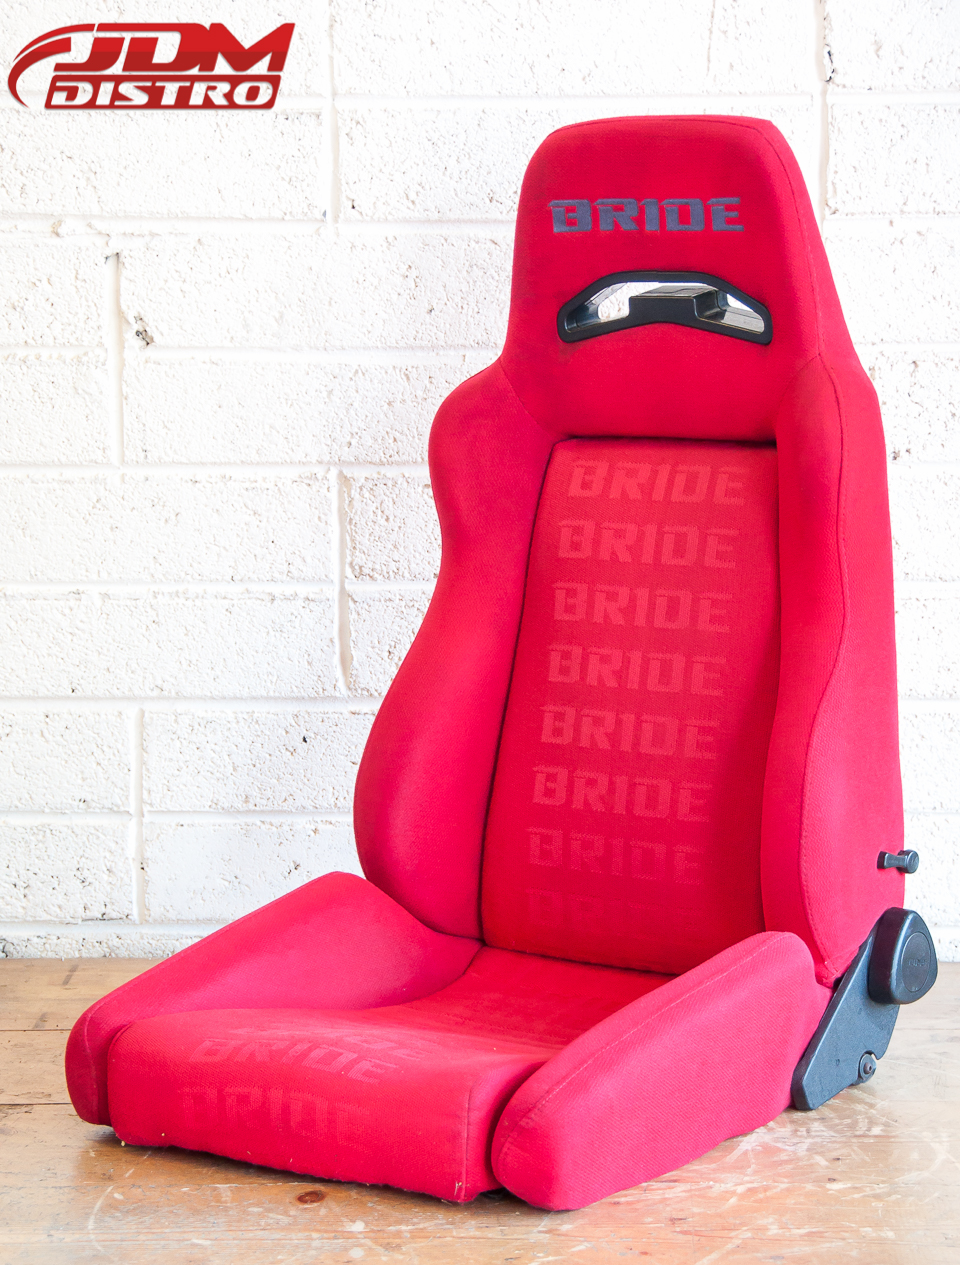 BRIDE RACING SEAT – REVS red for sale uk europe-1